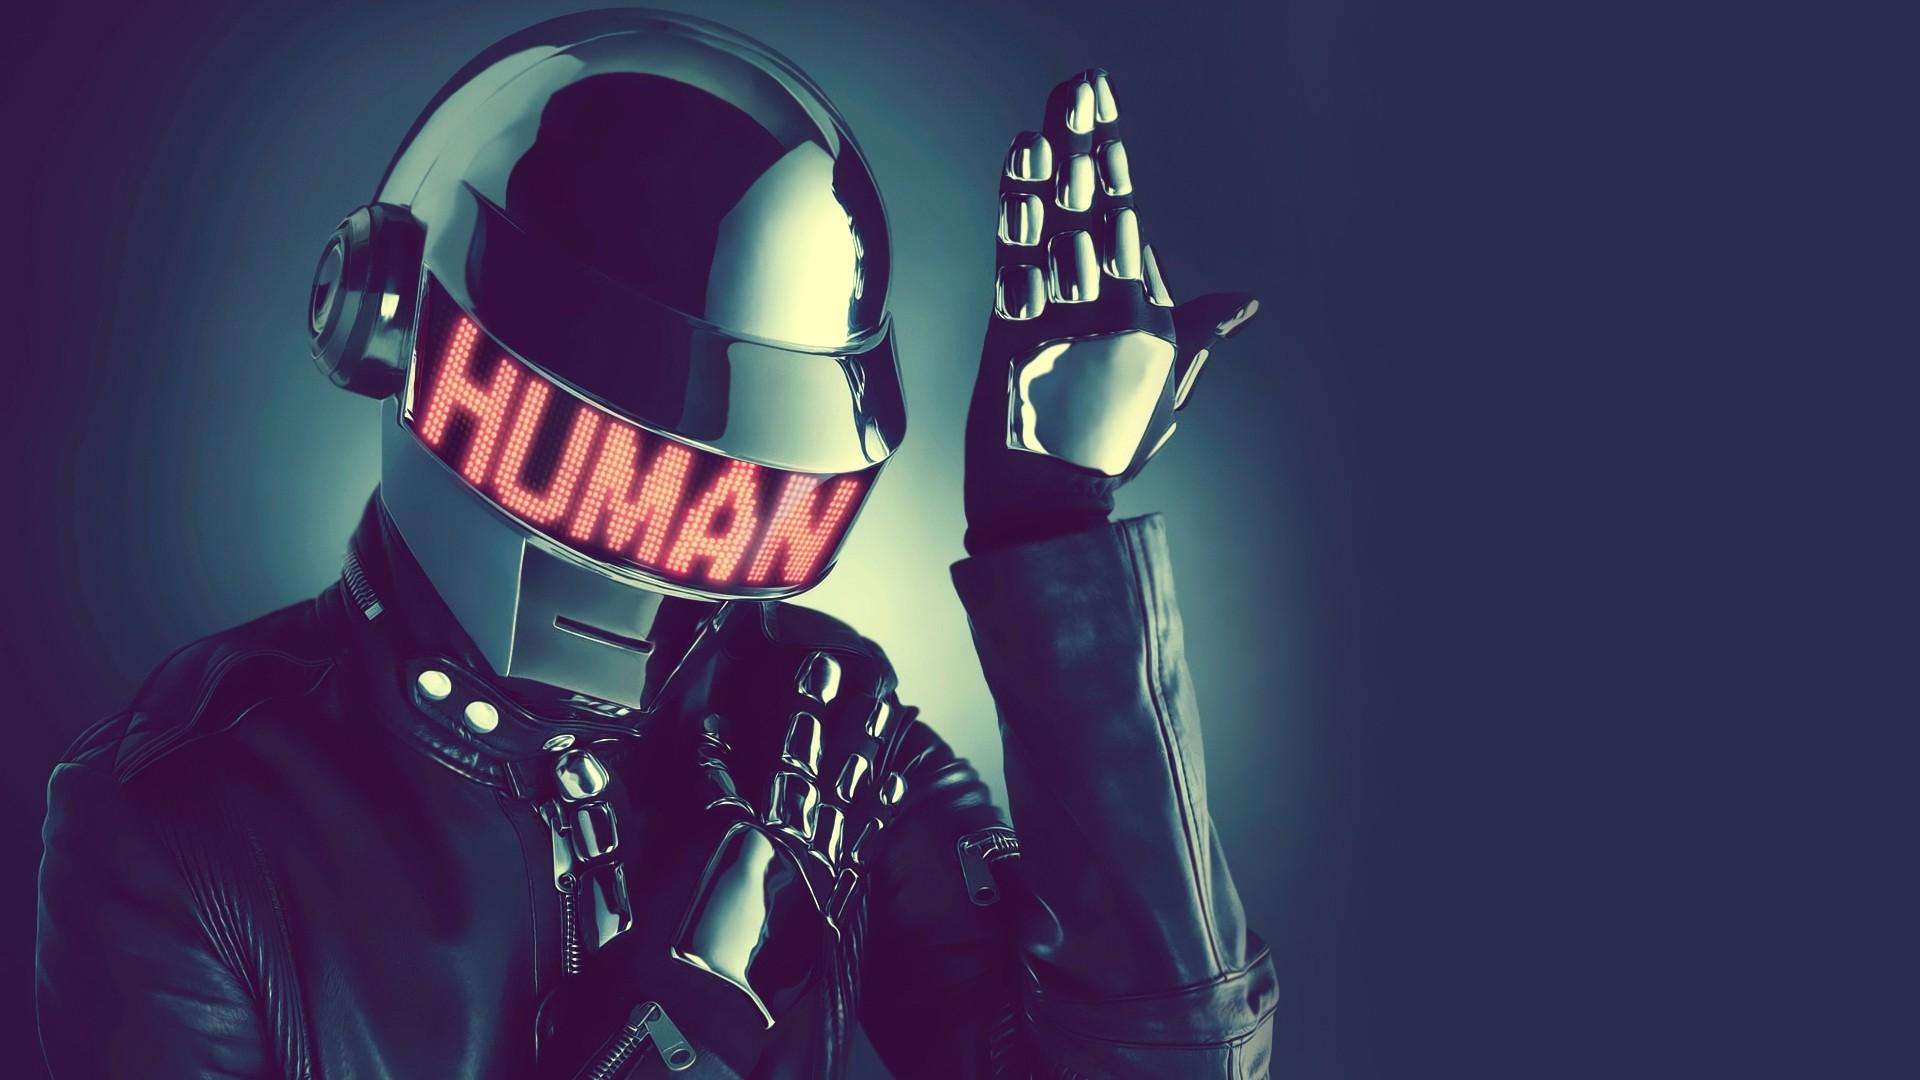 Daft Punk Wallpaper theme